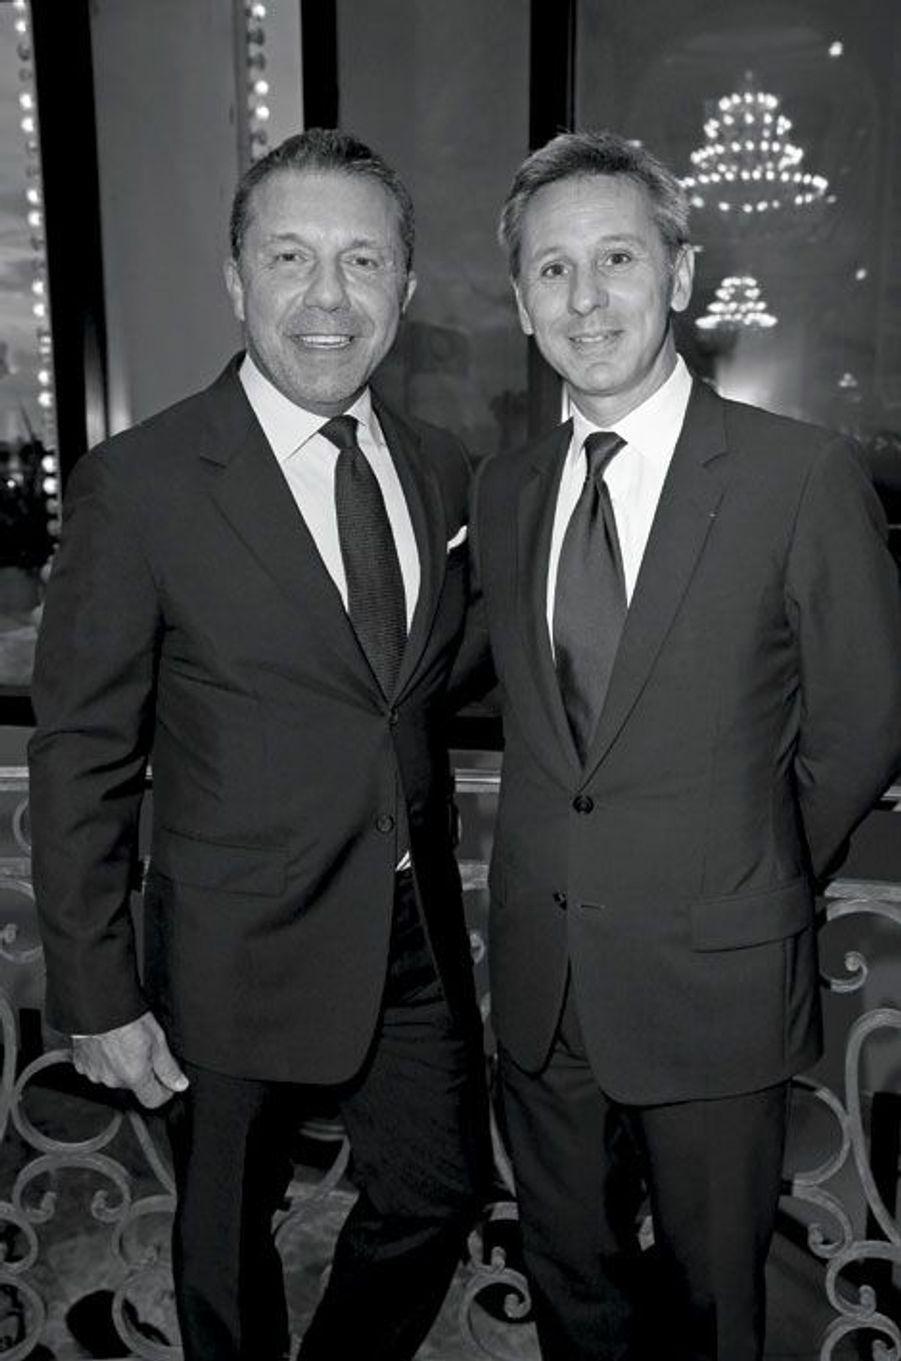 Olivier Picasso et Christophe Beaux